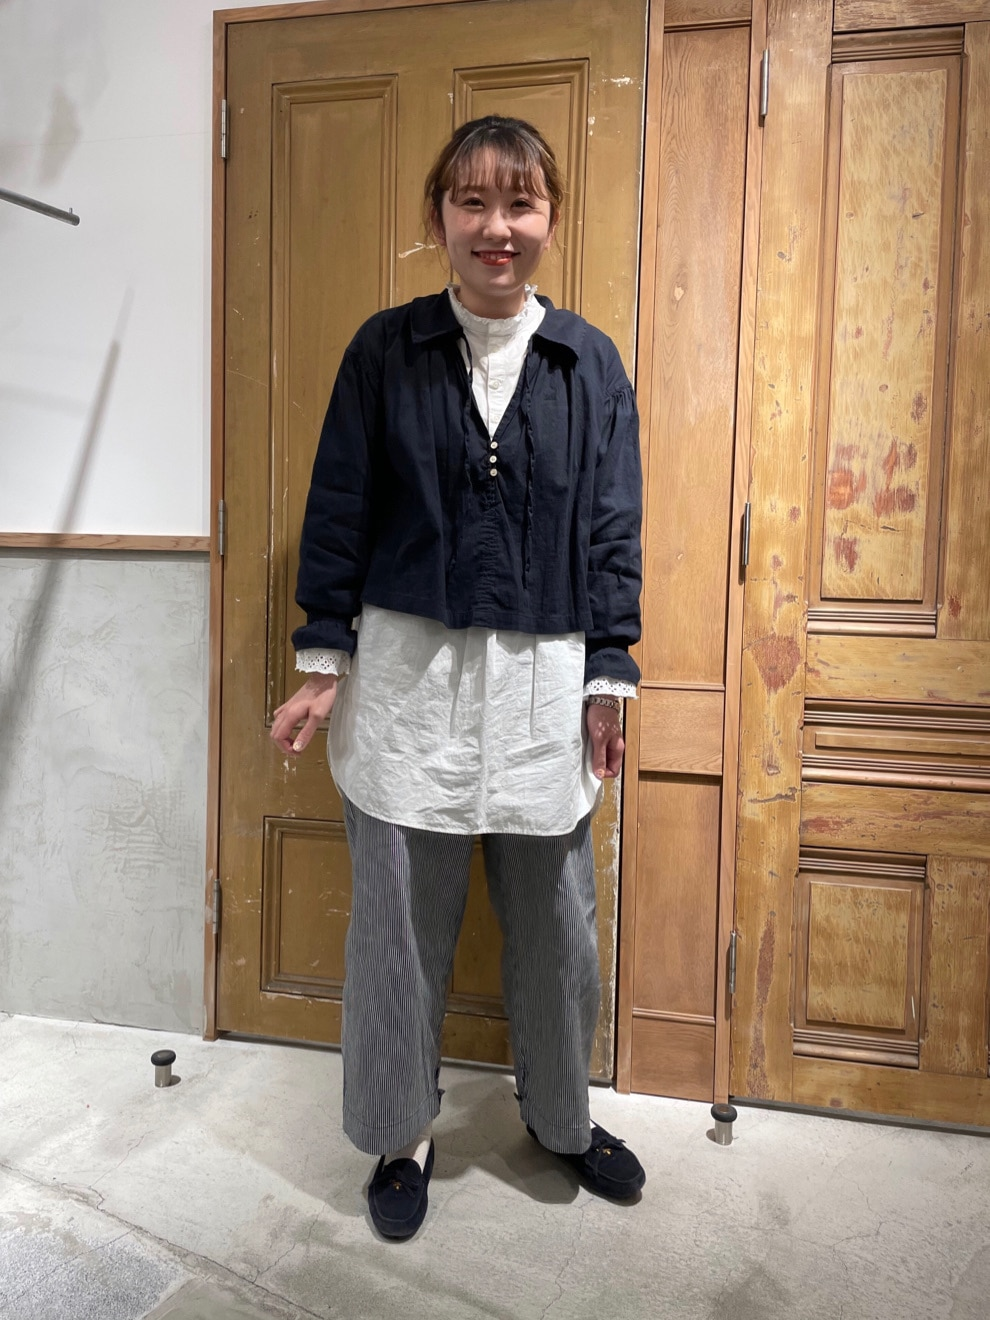 Malle chambre de charme ルミネ新宿 身長:163cm 2020.12.16